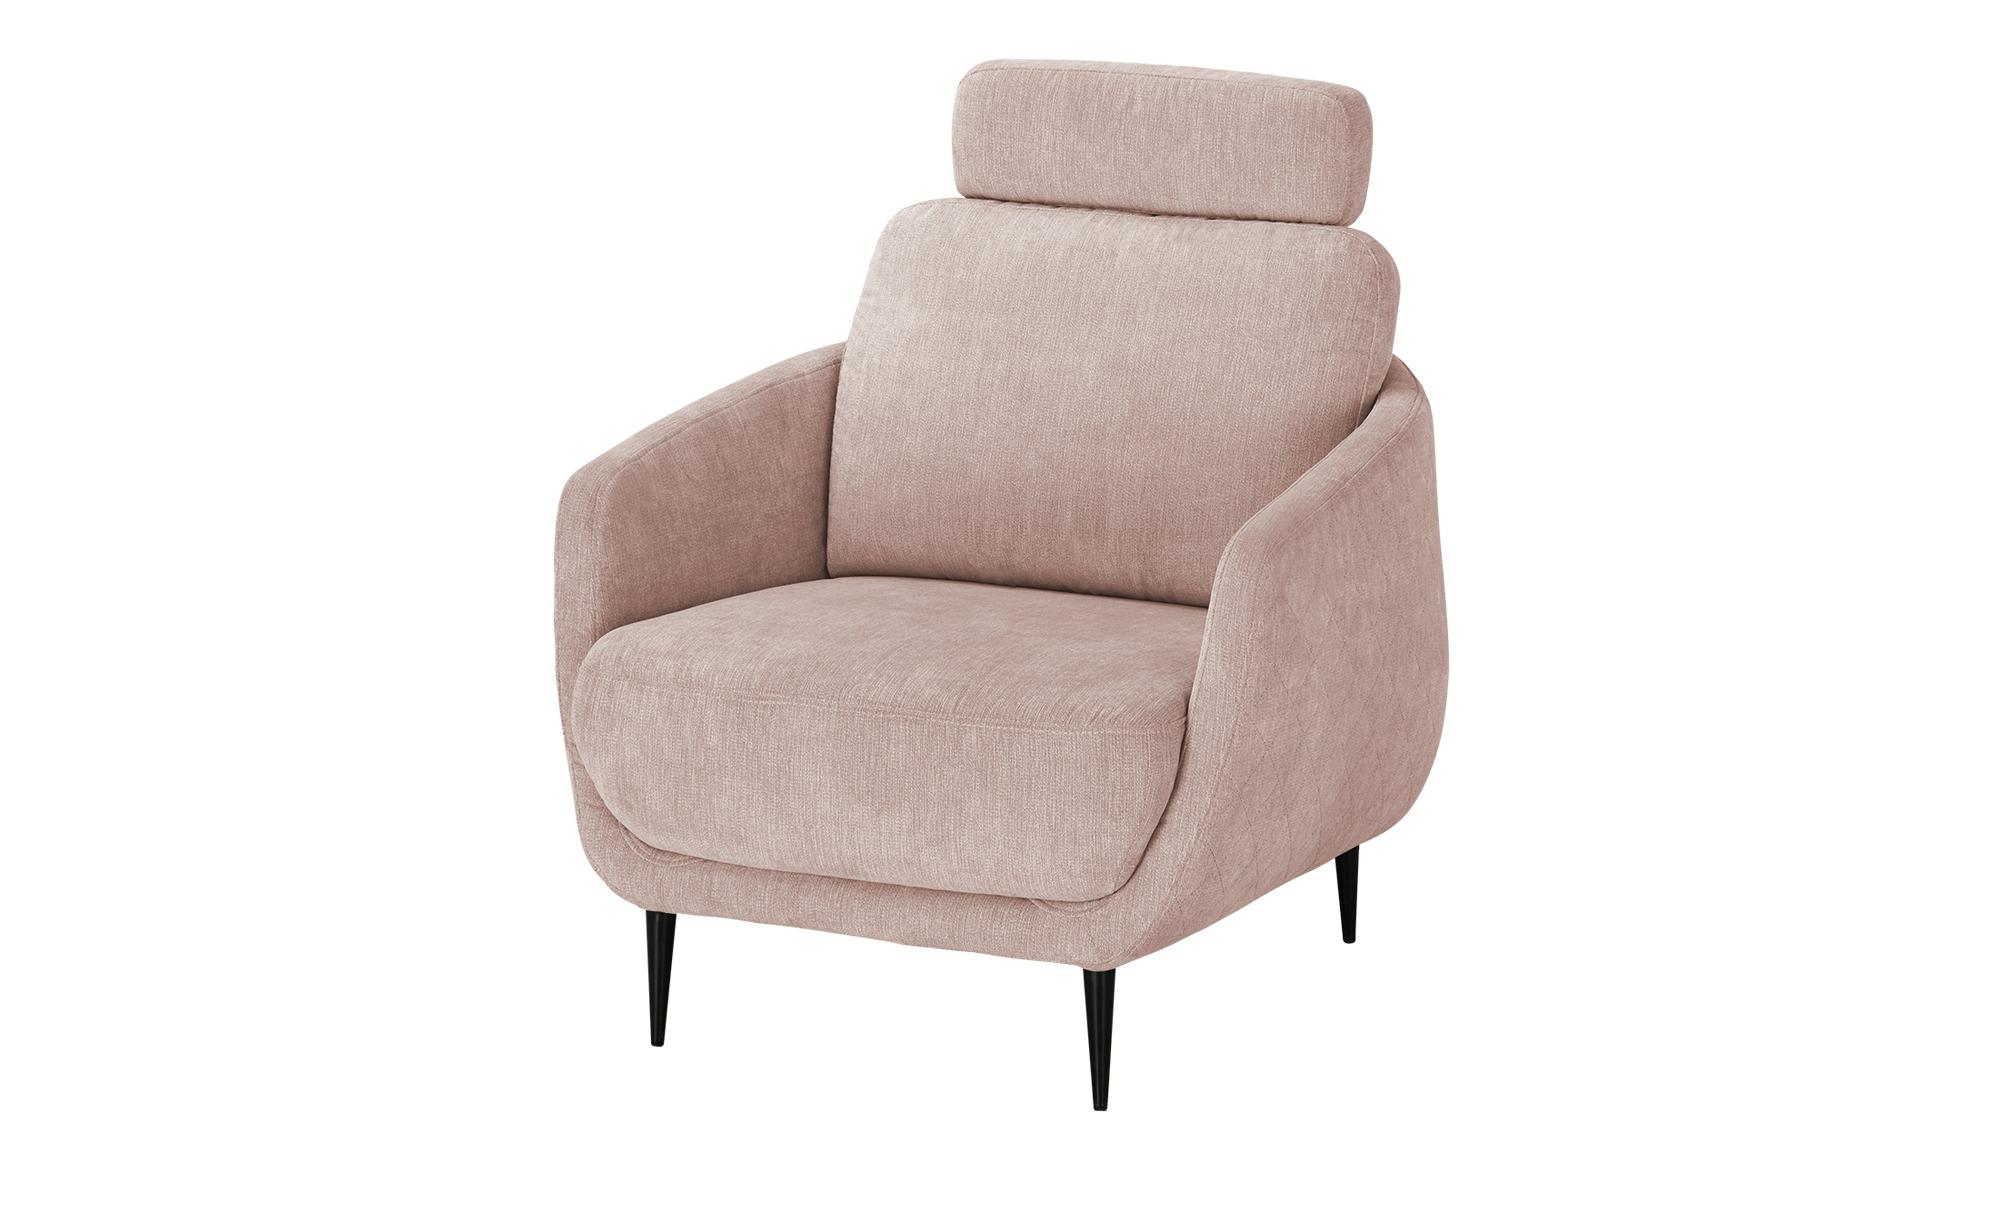 Max Schelling Sessel  Signature ¦ rosa/pink ¦ Maße (cm): B: 78 H: 79 T: 88 Polstermöbel > Sessel > Polstersessel - Höffner